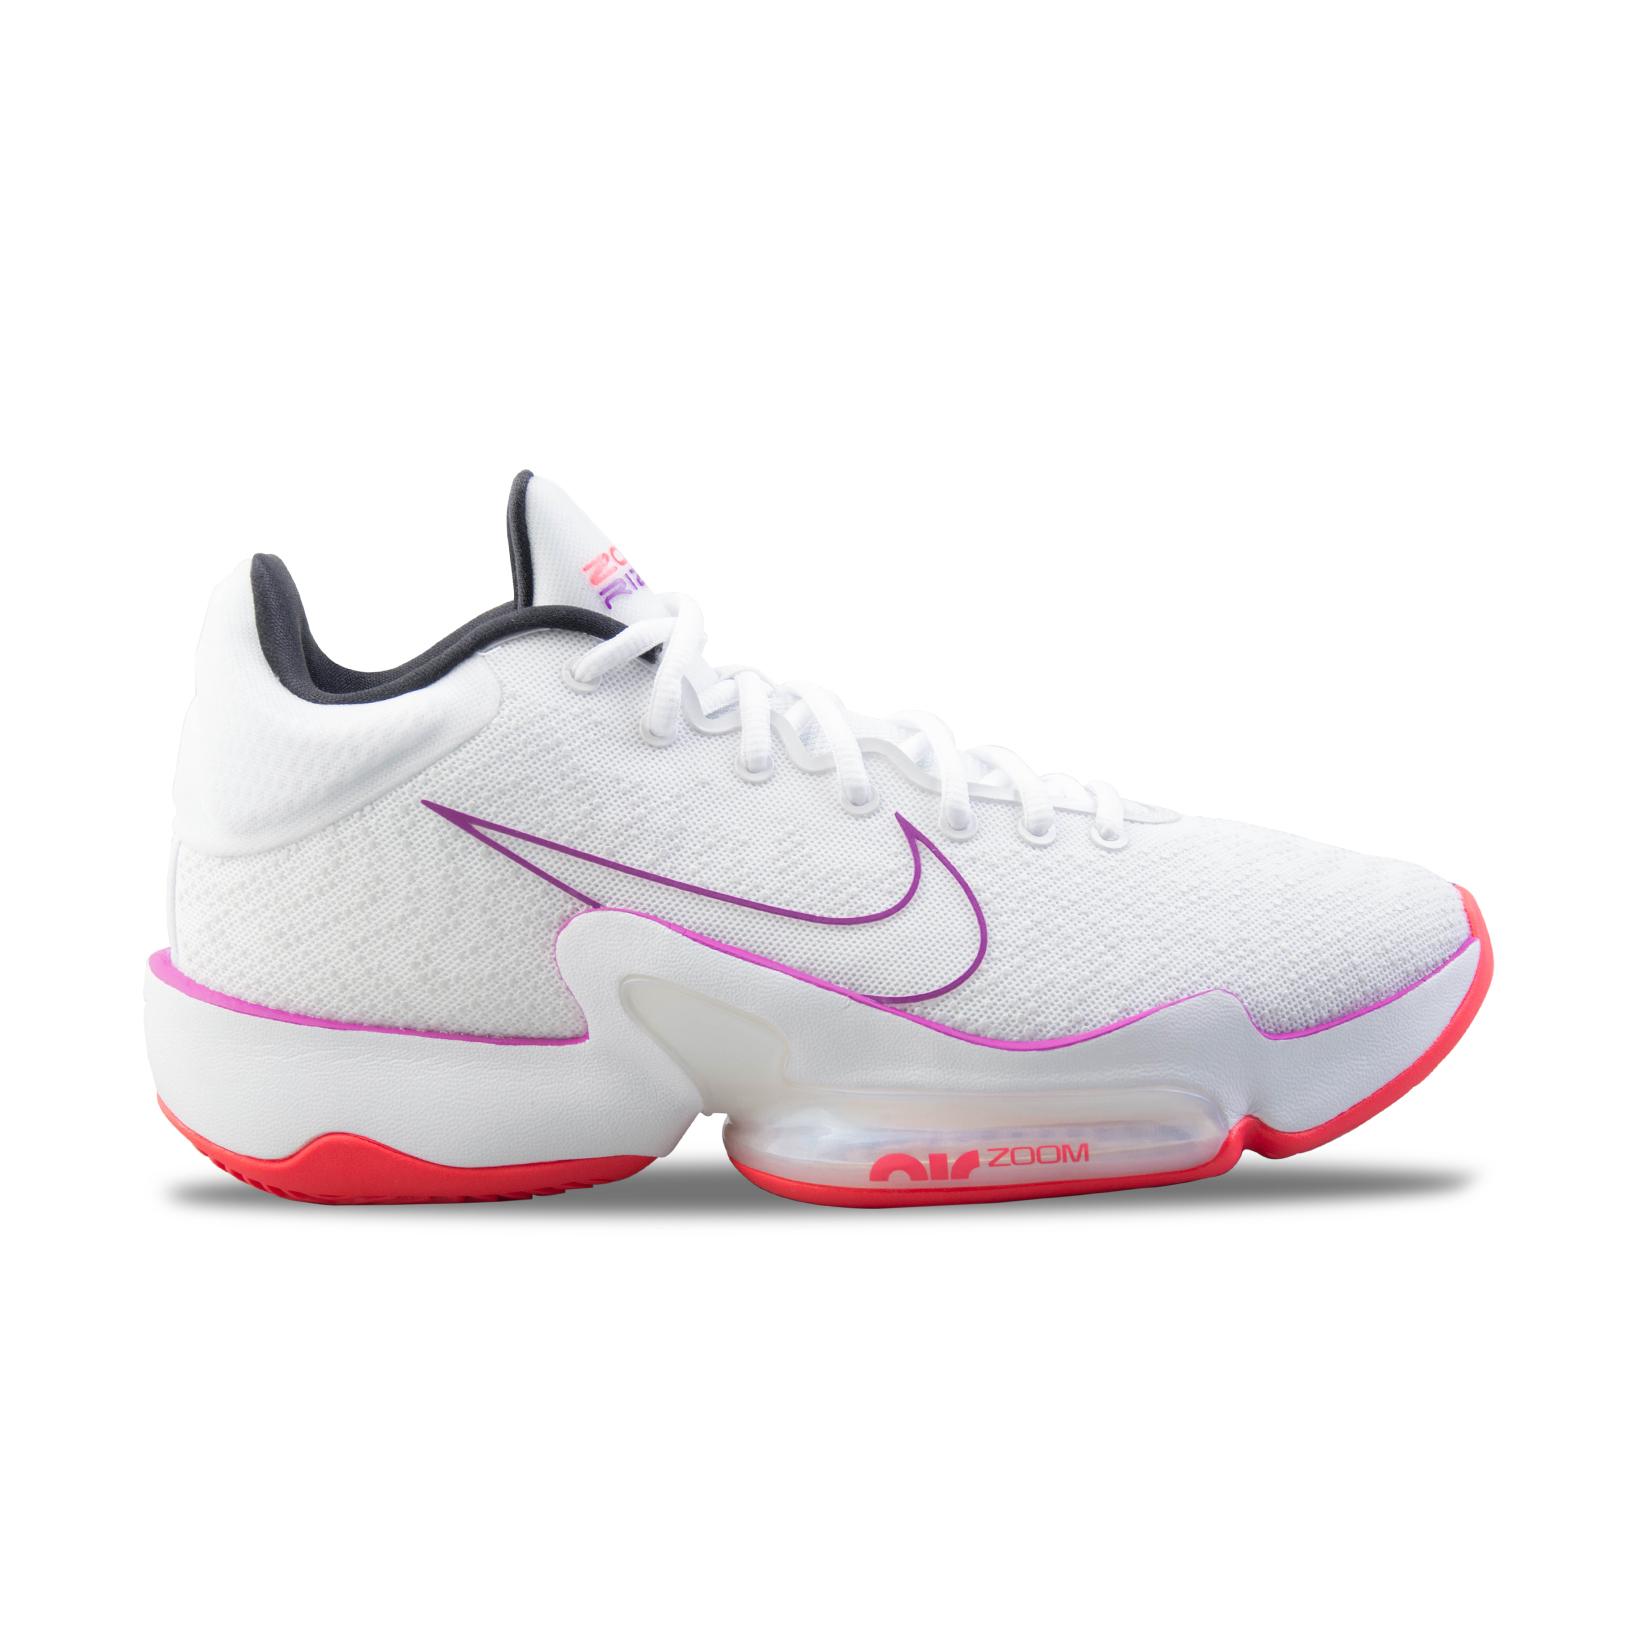 Nike Zoom Rize 2 White